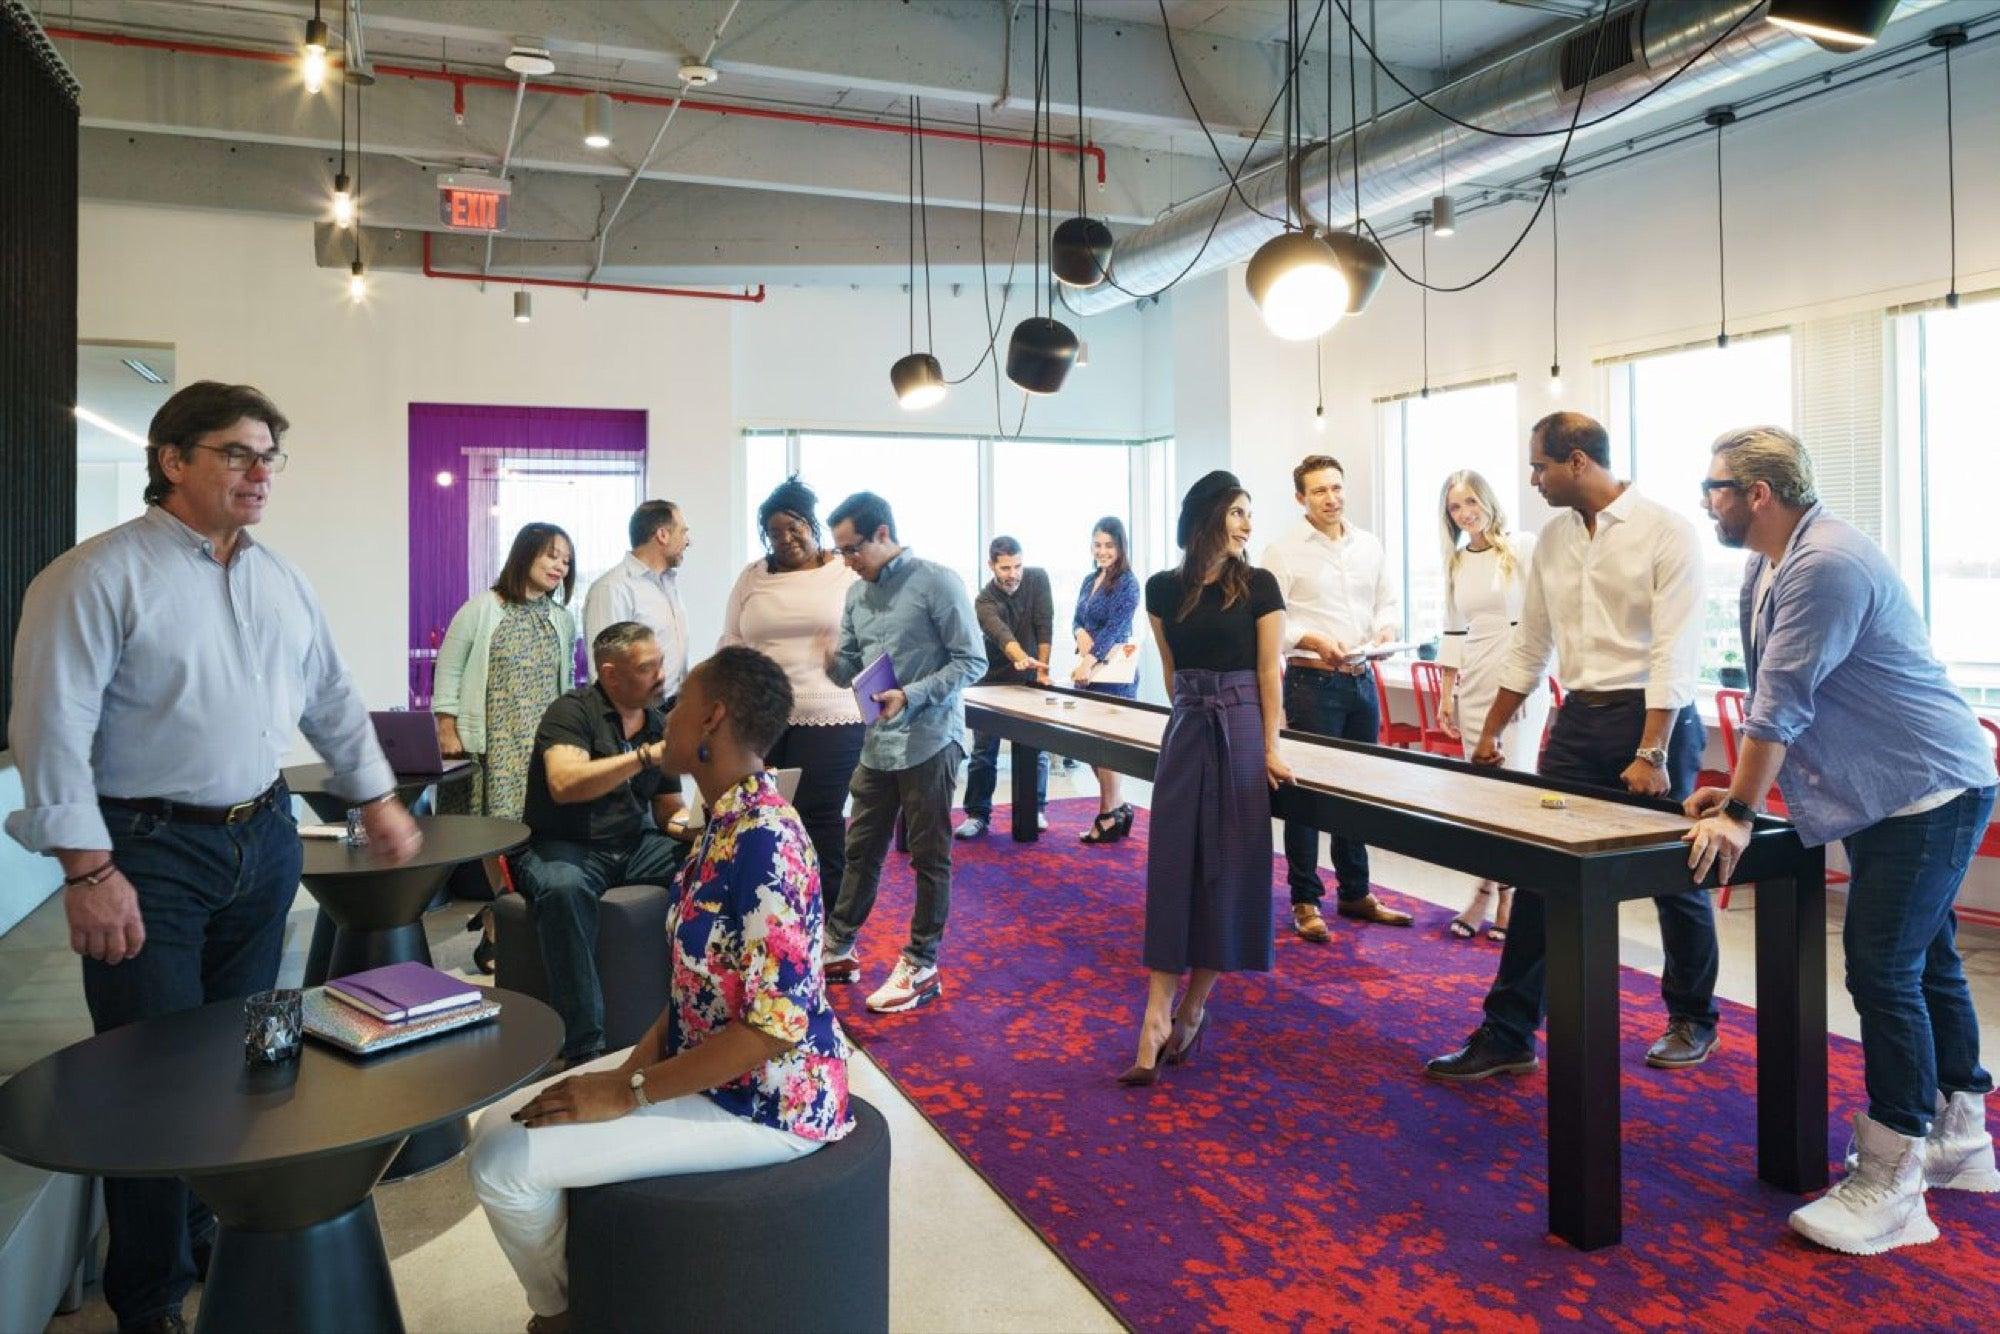 Inside Richard Bransonu0027s New Cruise Line Startup. Office Space